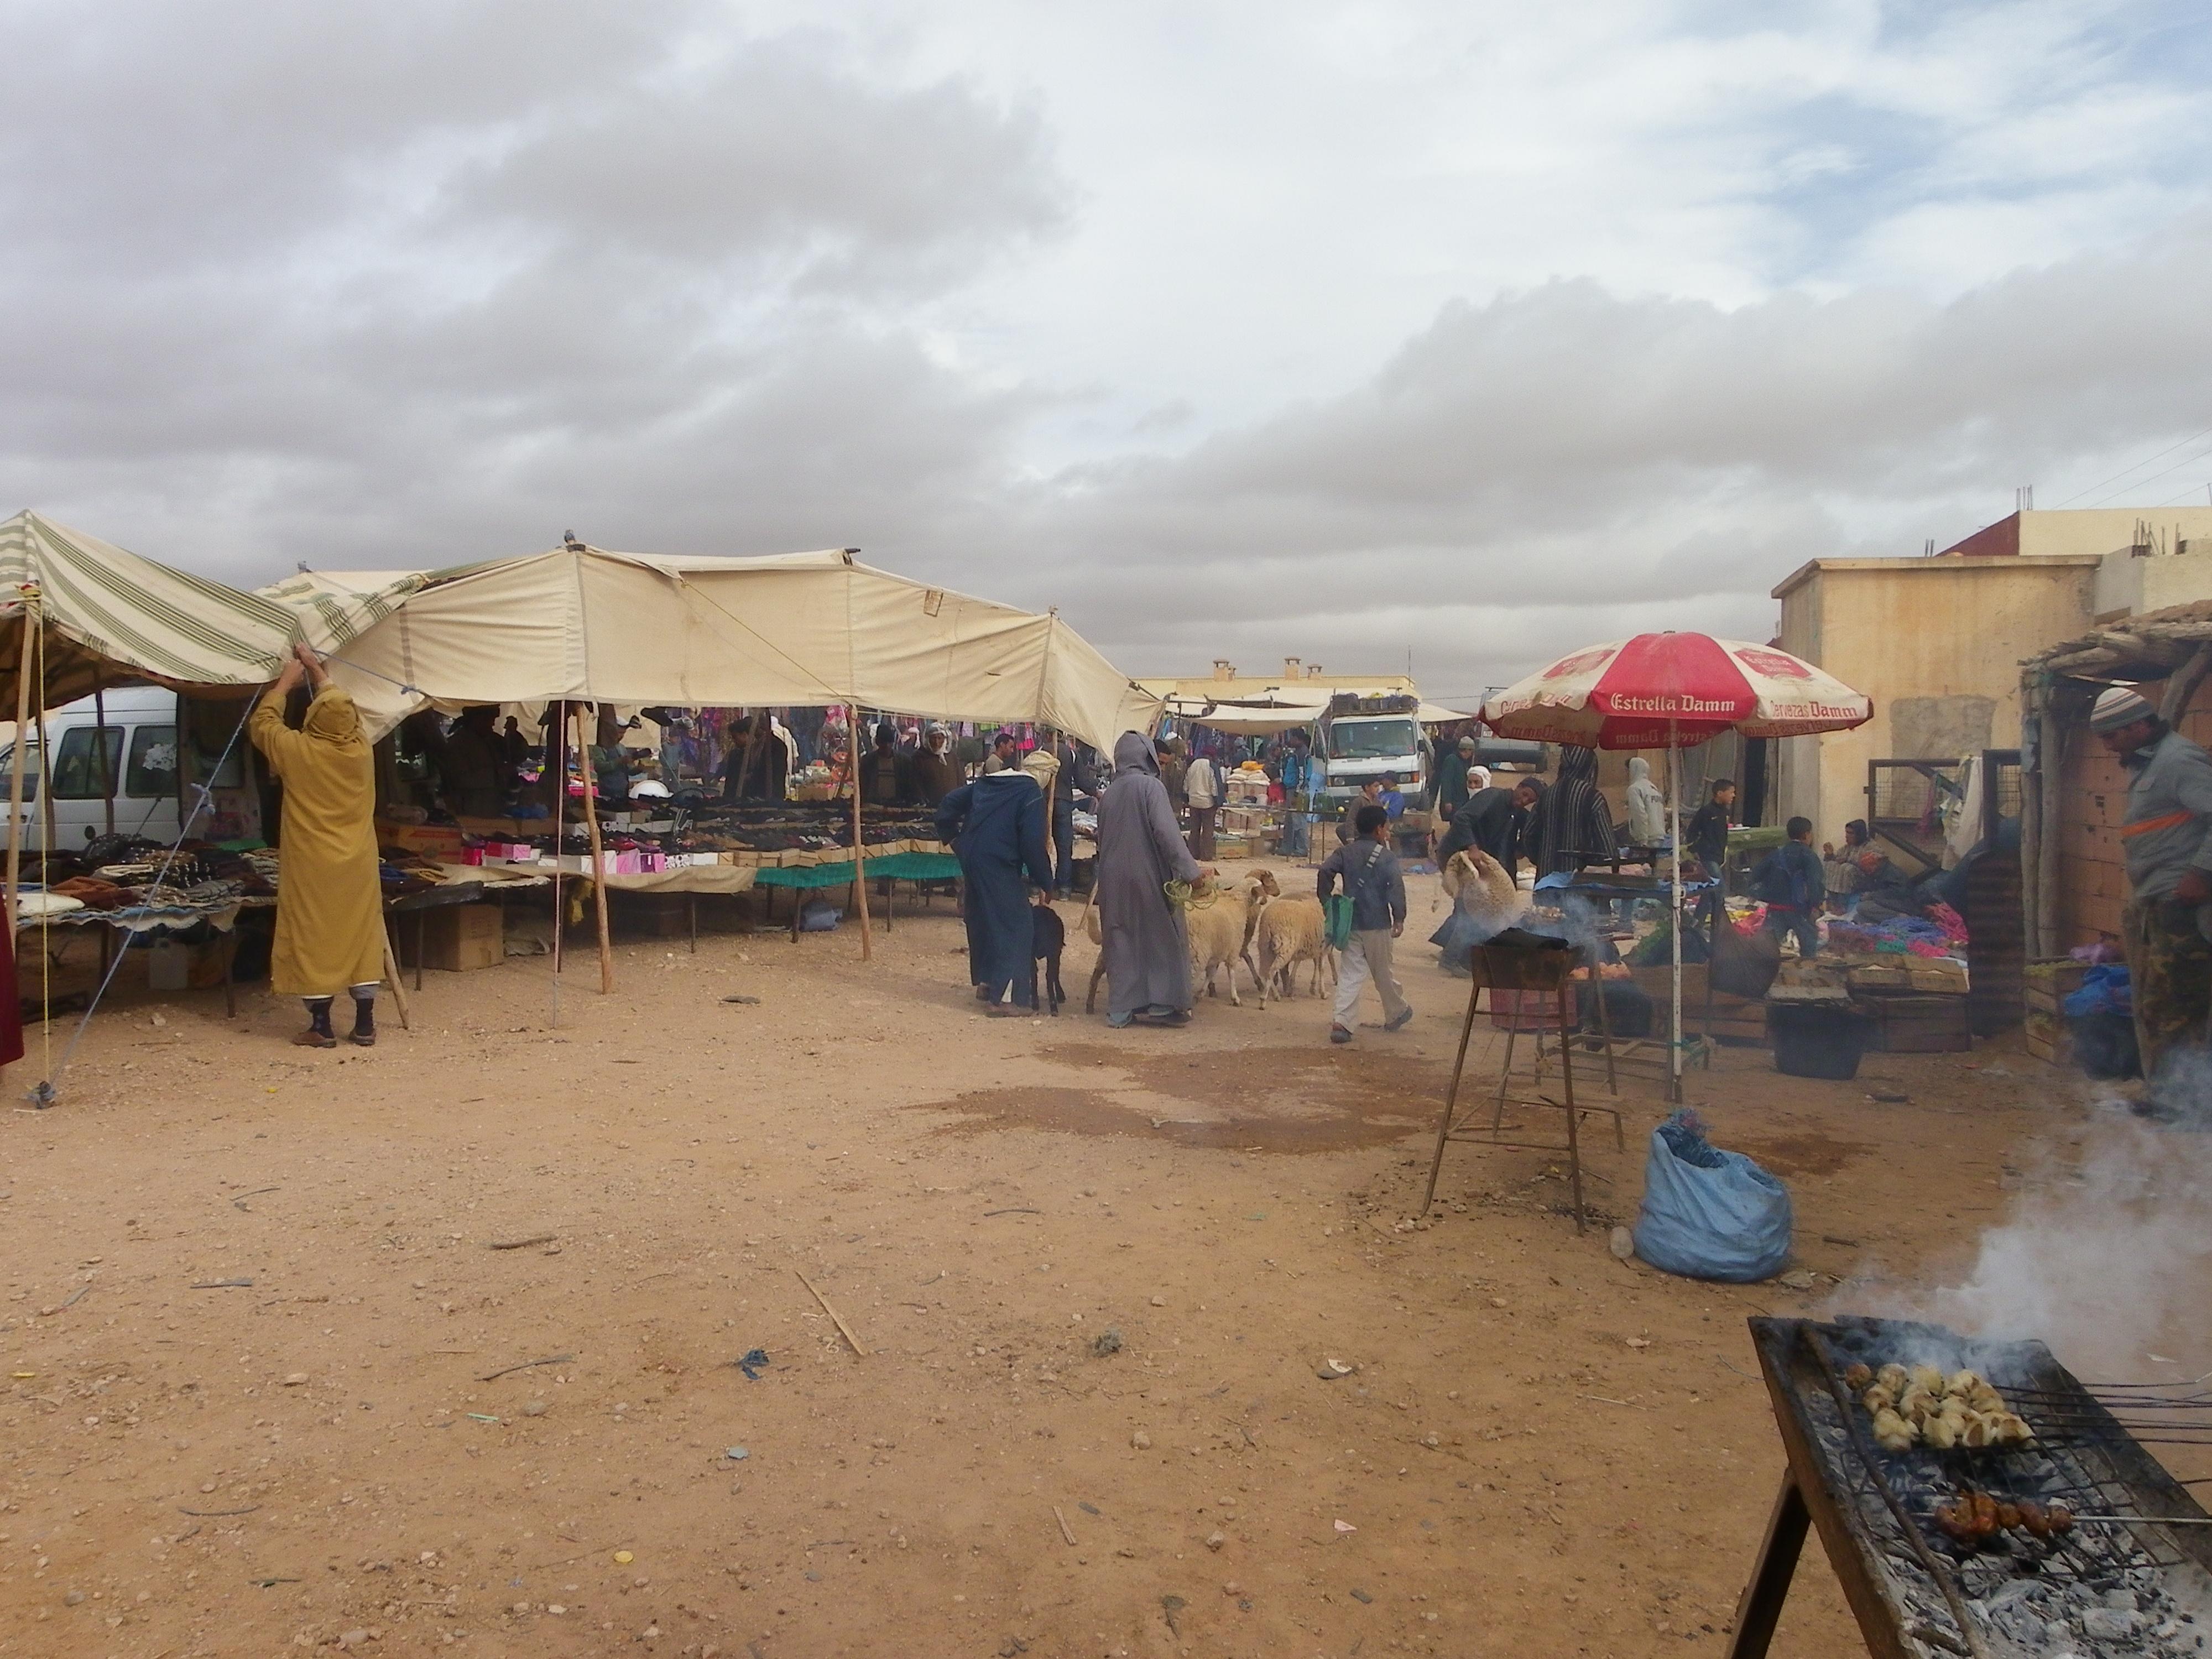 https://static.blog4ever.com/2012/02/654350/Maroc-2.JPG